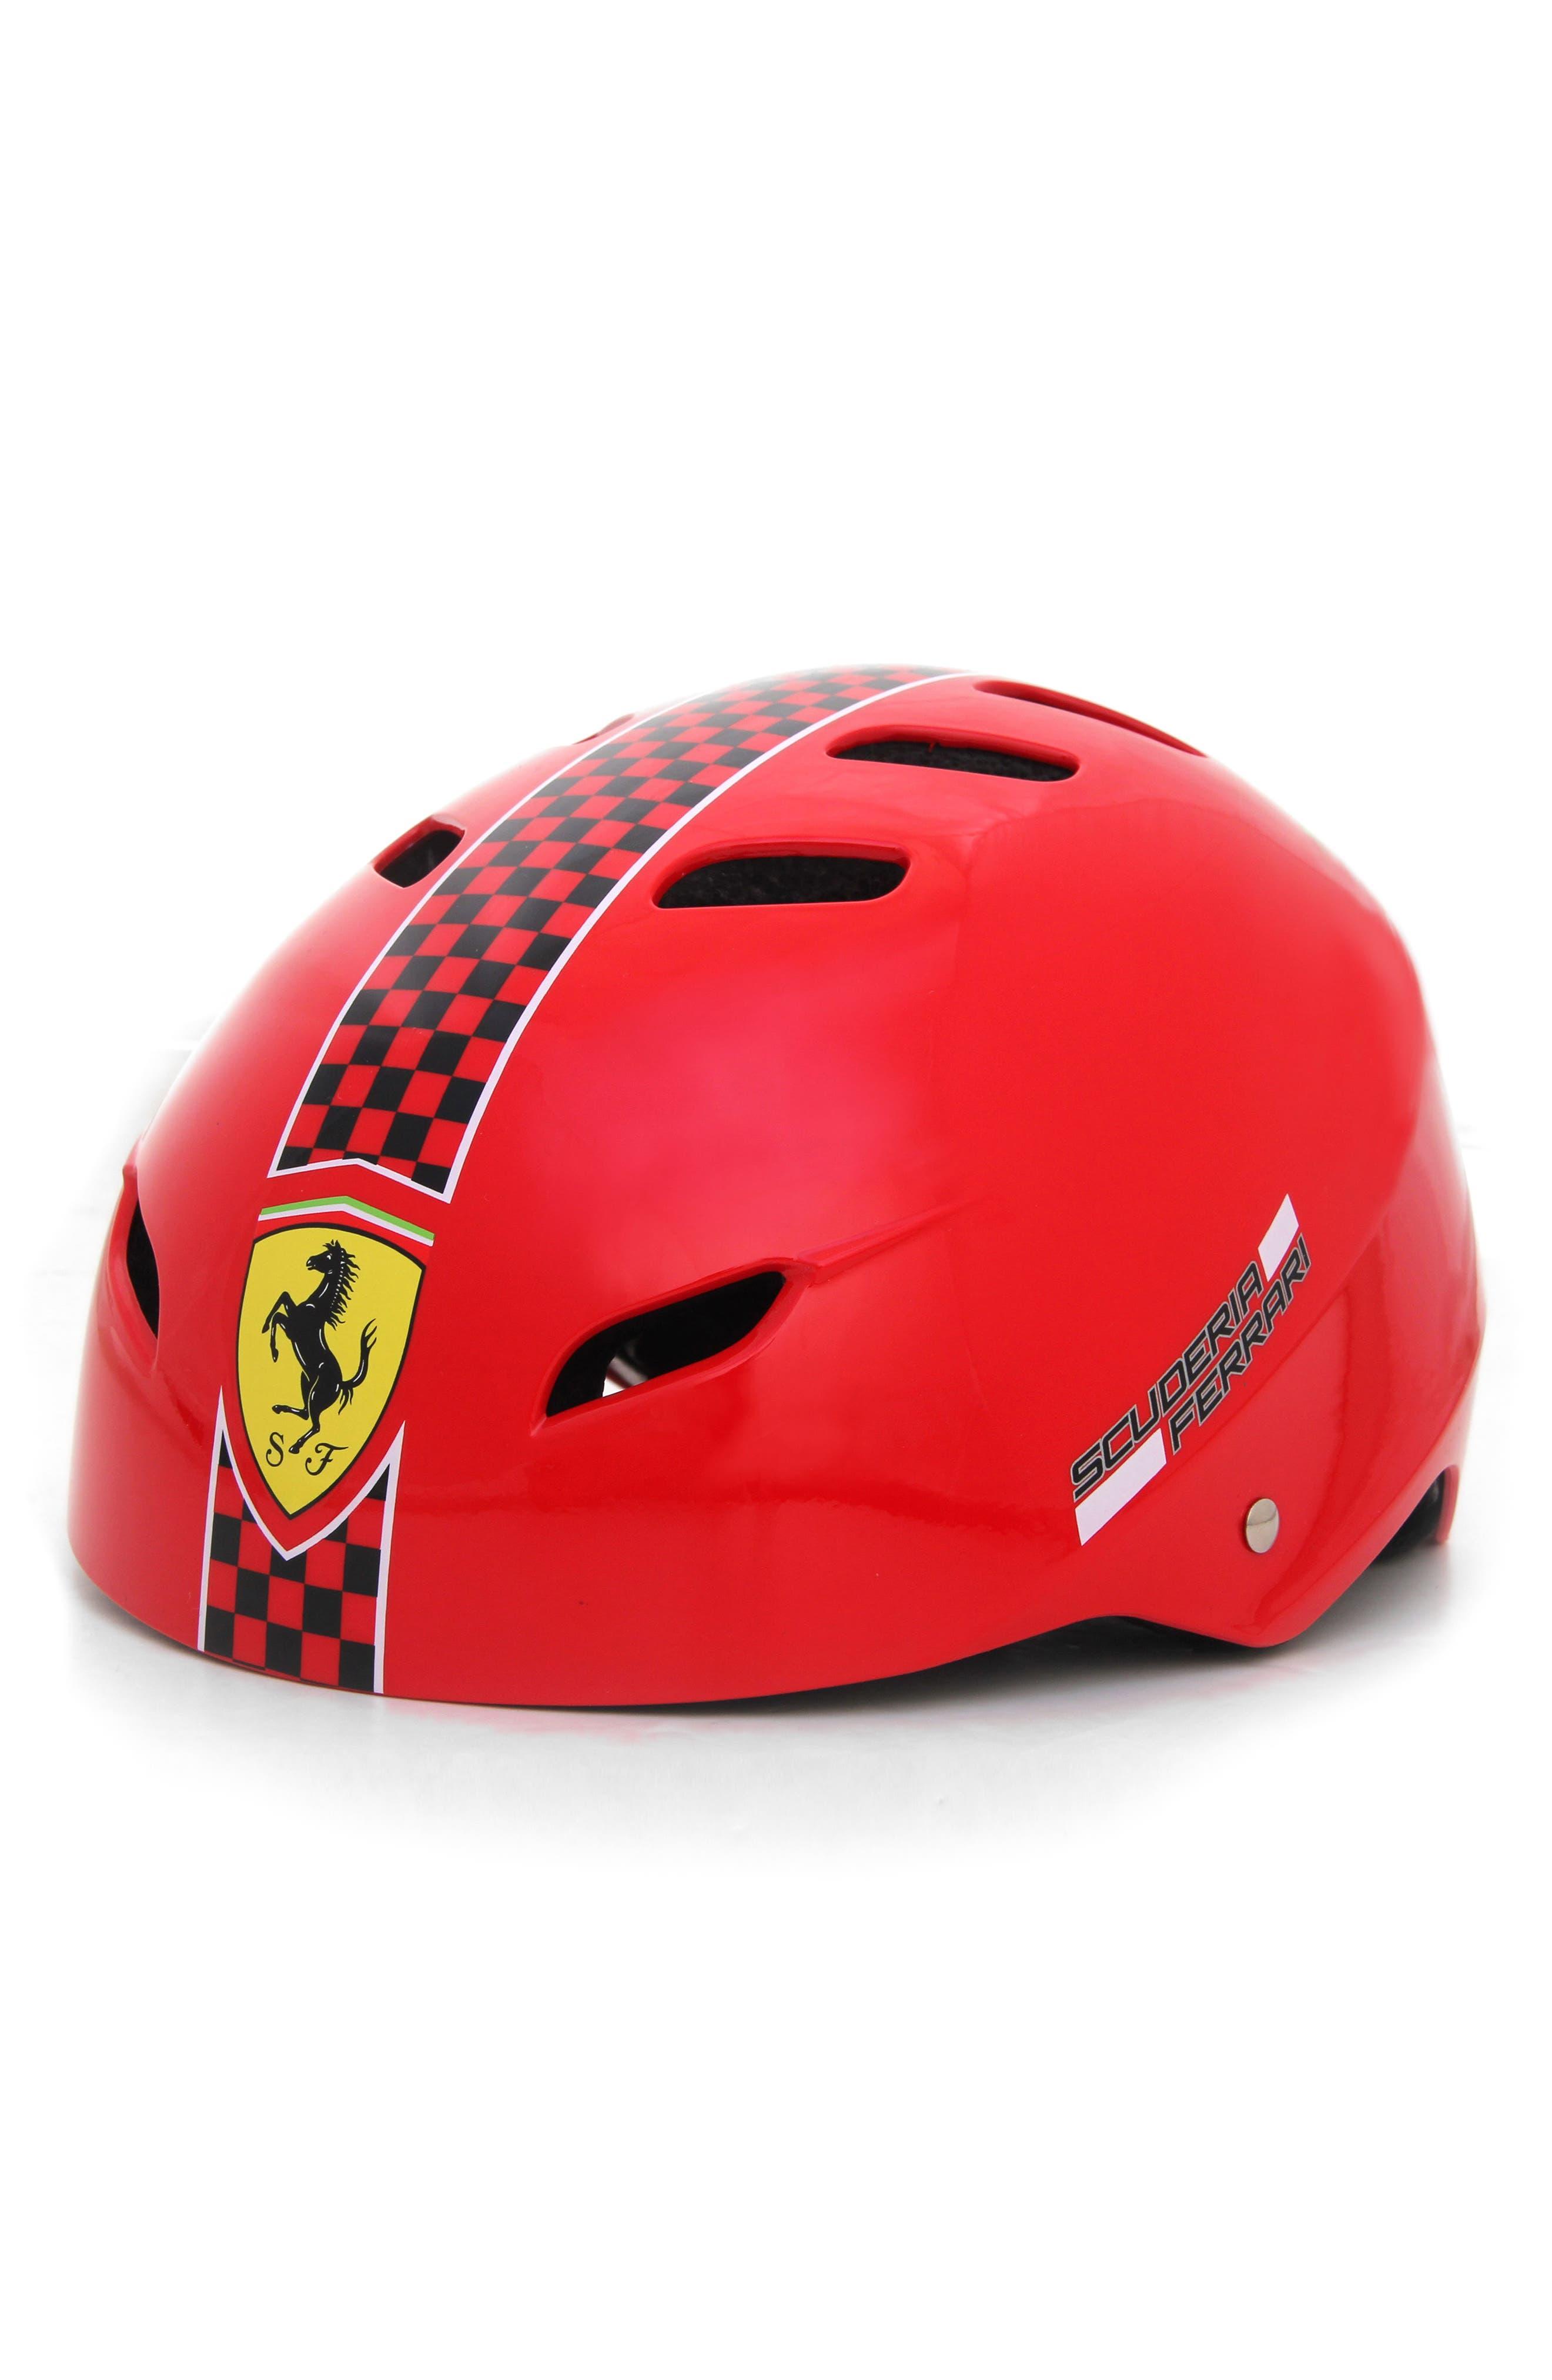 F1 Racing Helmet,                             Alternate thumbnail 2, color,                             Red